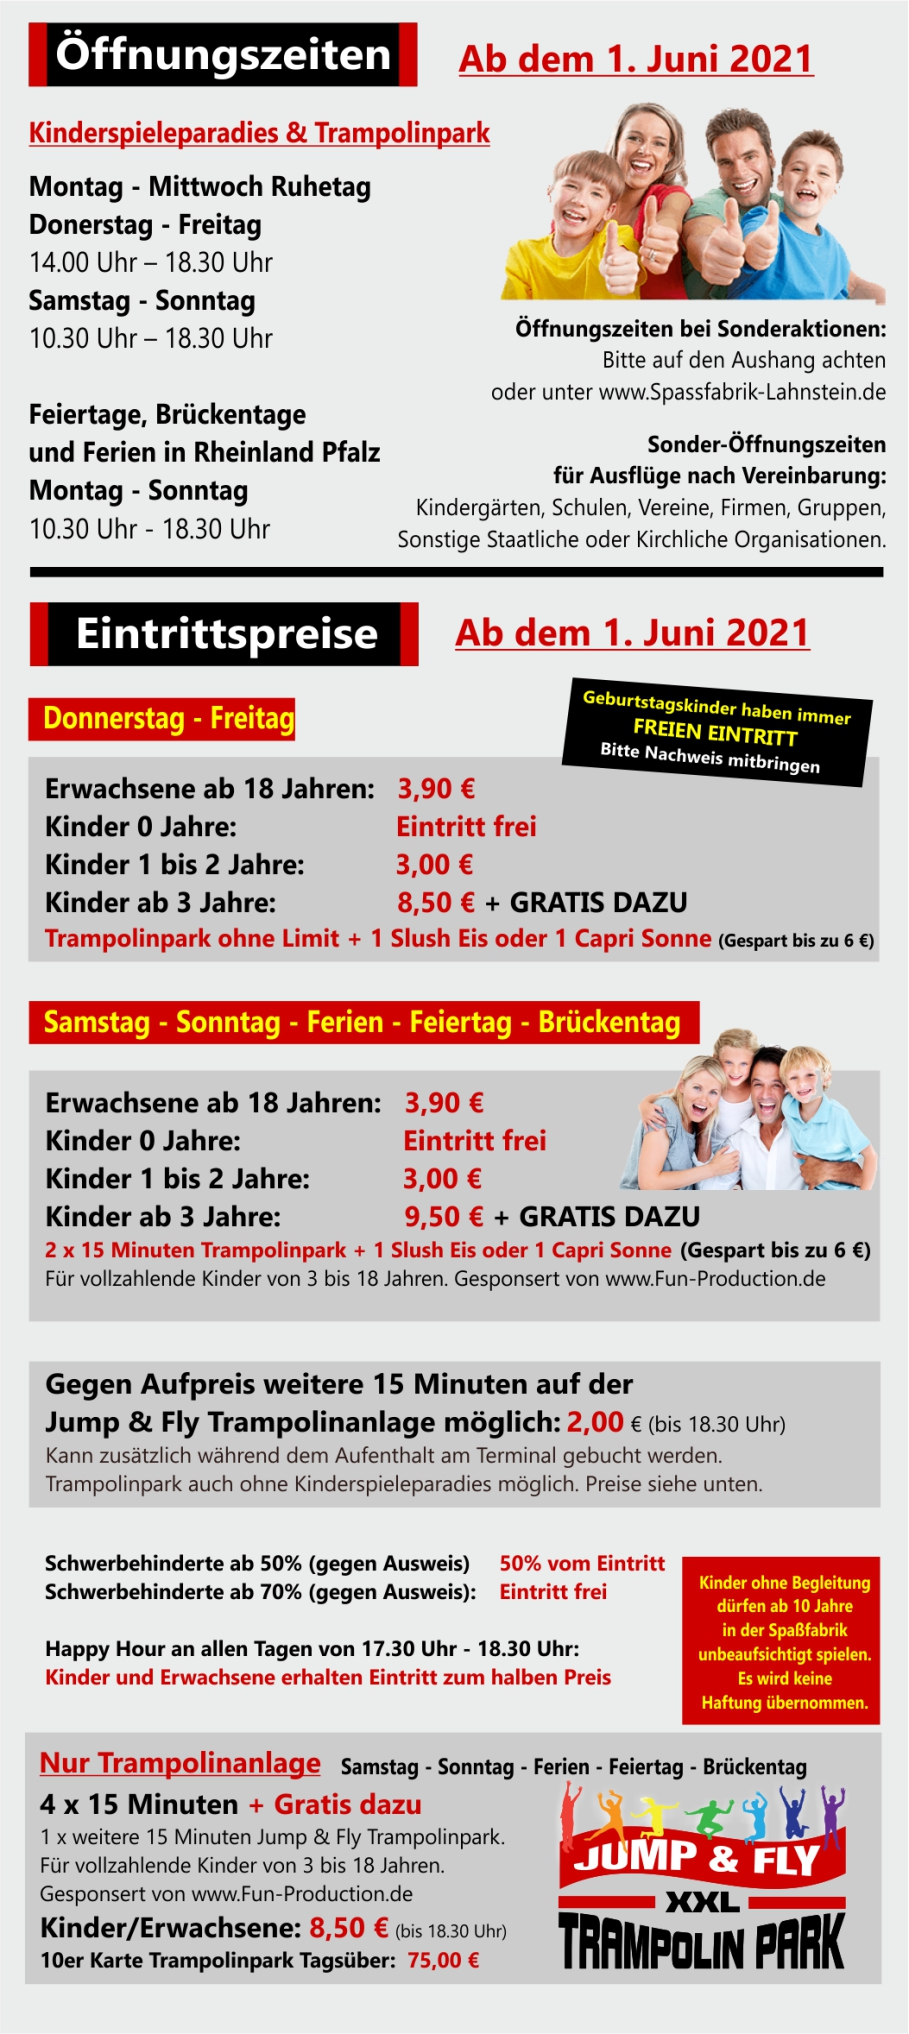 preise   Spassfabrik Lahnstein